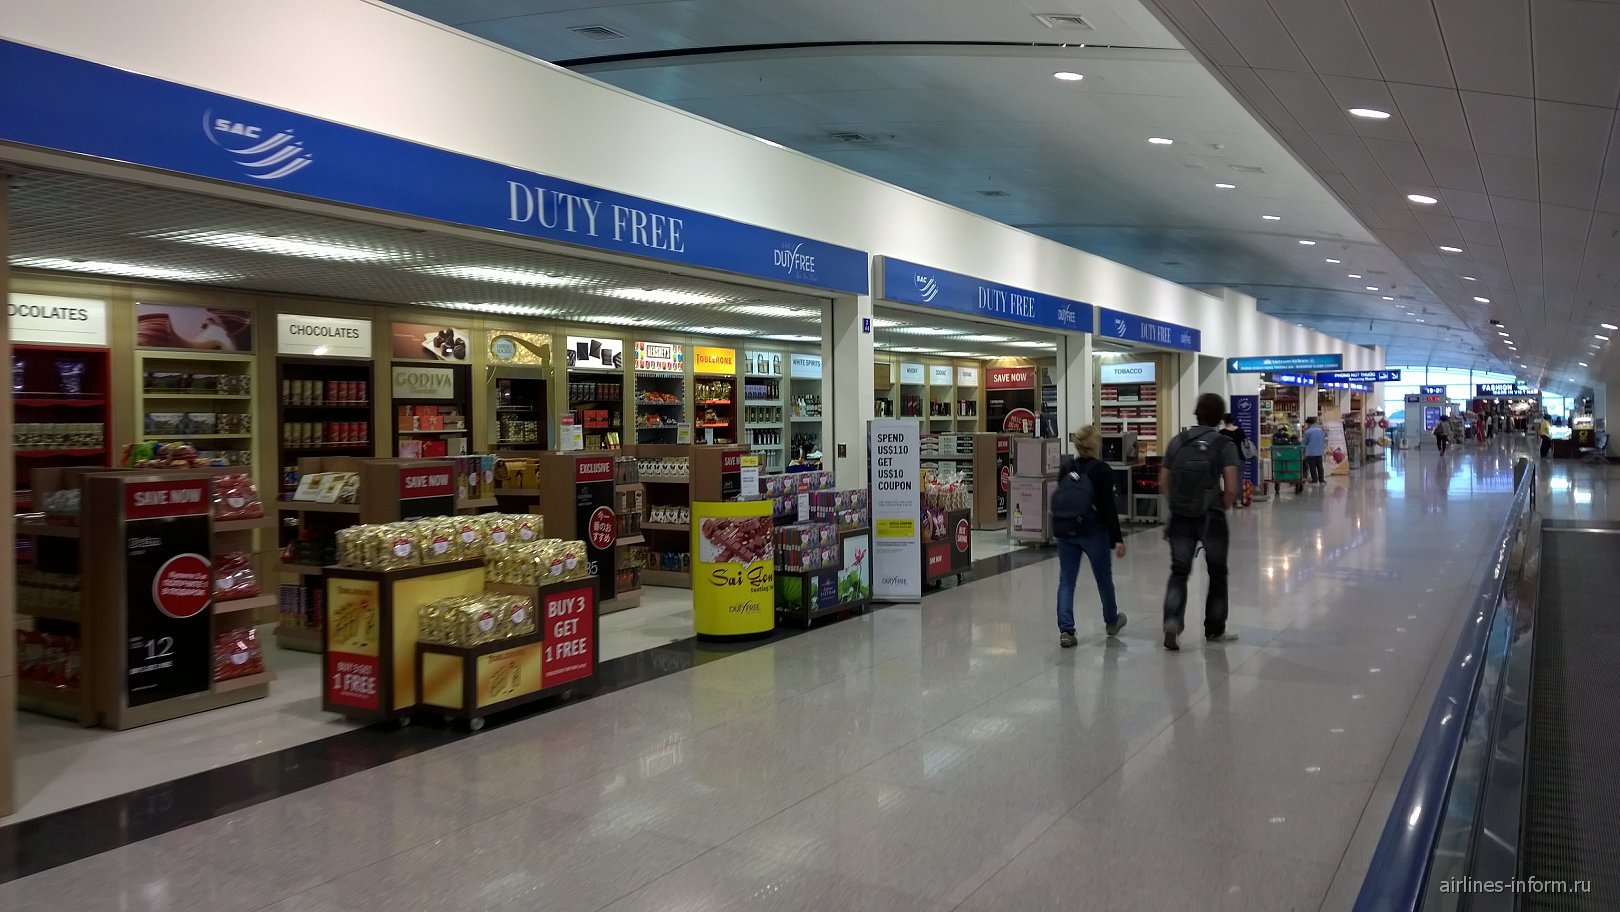 алерея магазинов в чистой зоне аэропорта Хошимин Тан Сон Нхат